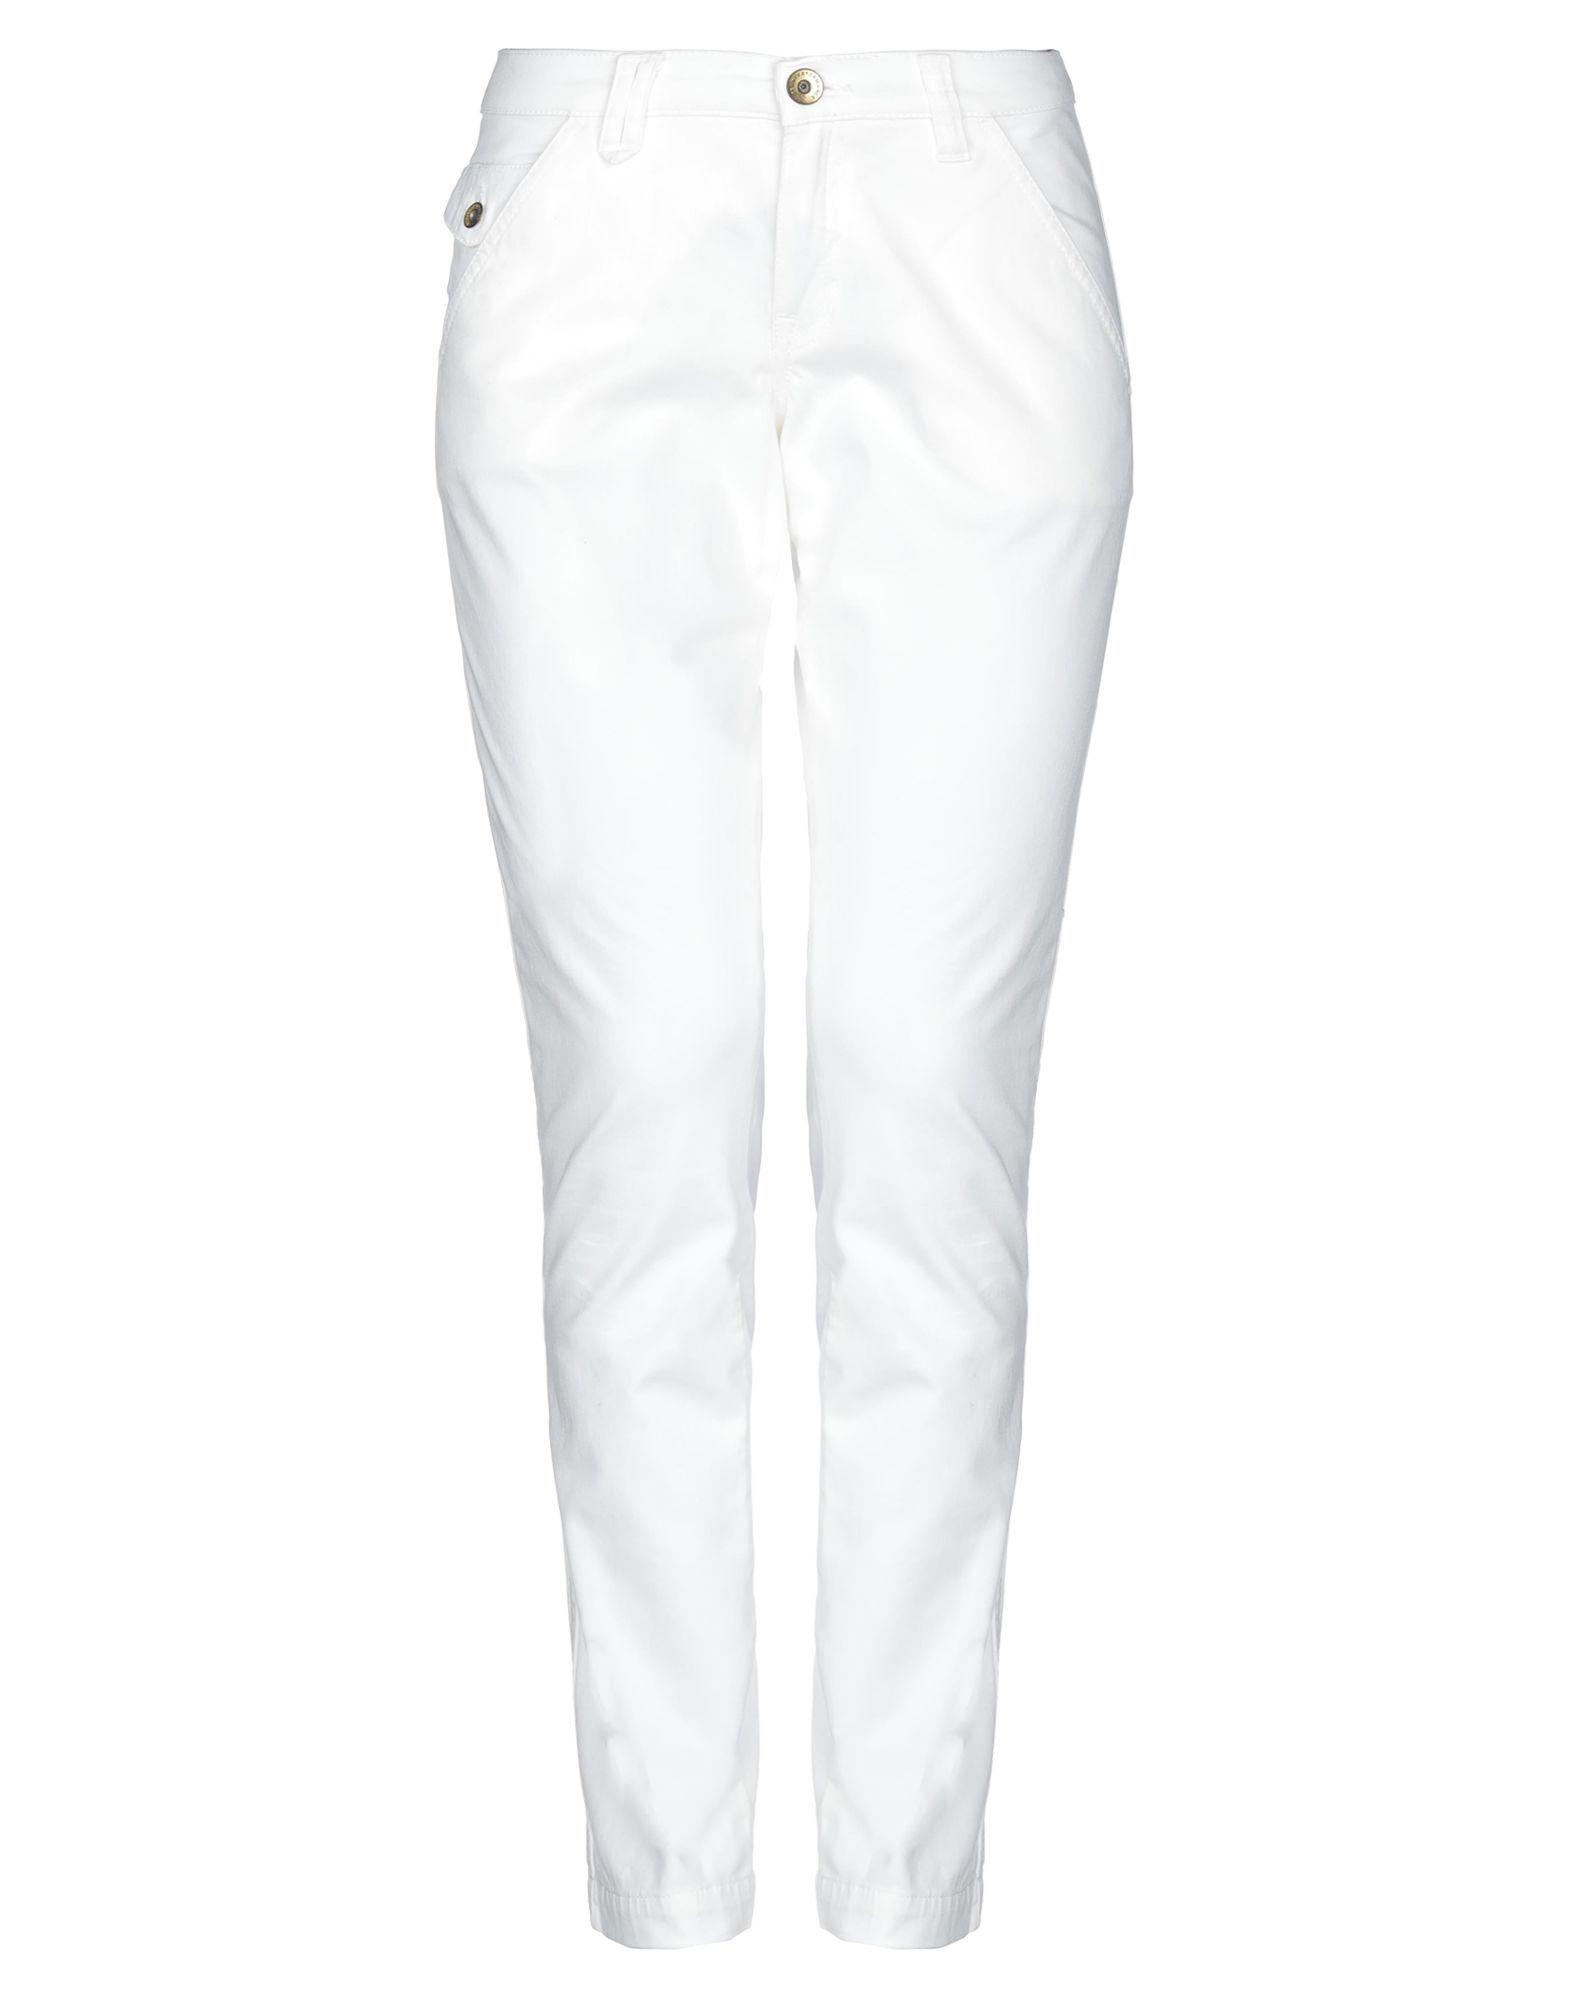 Peak Performance White Cotton Trousers